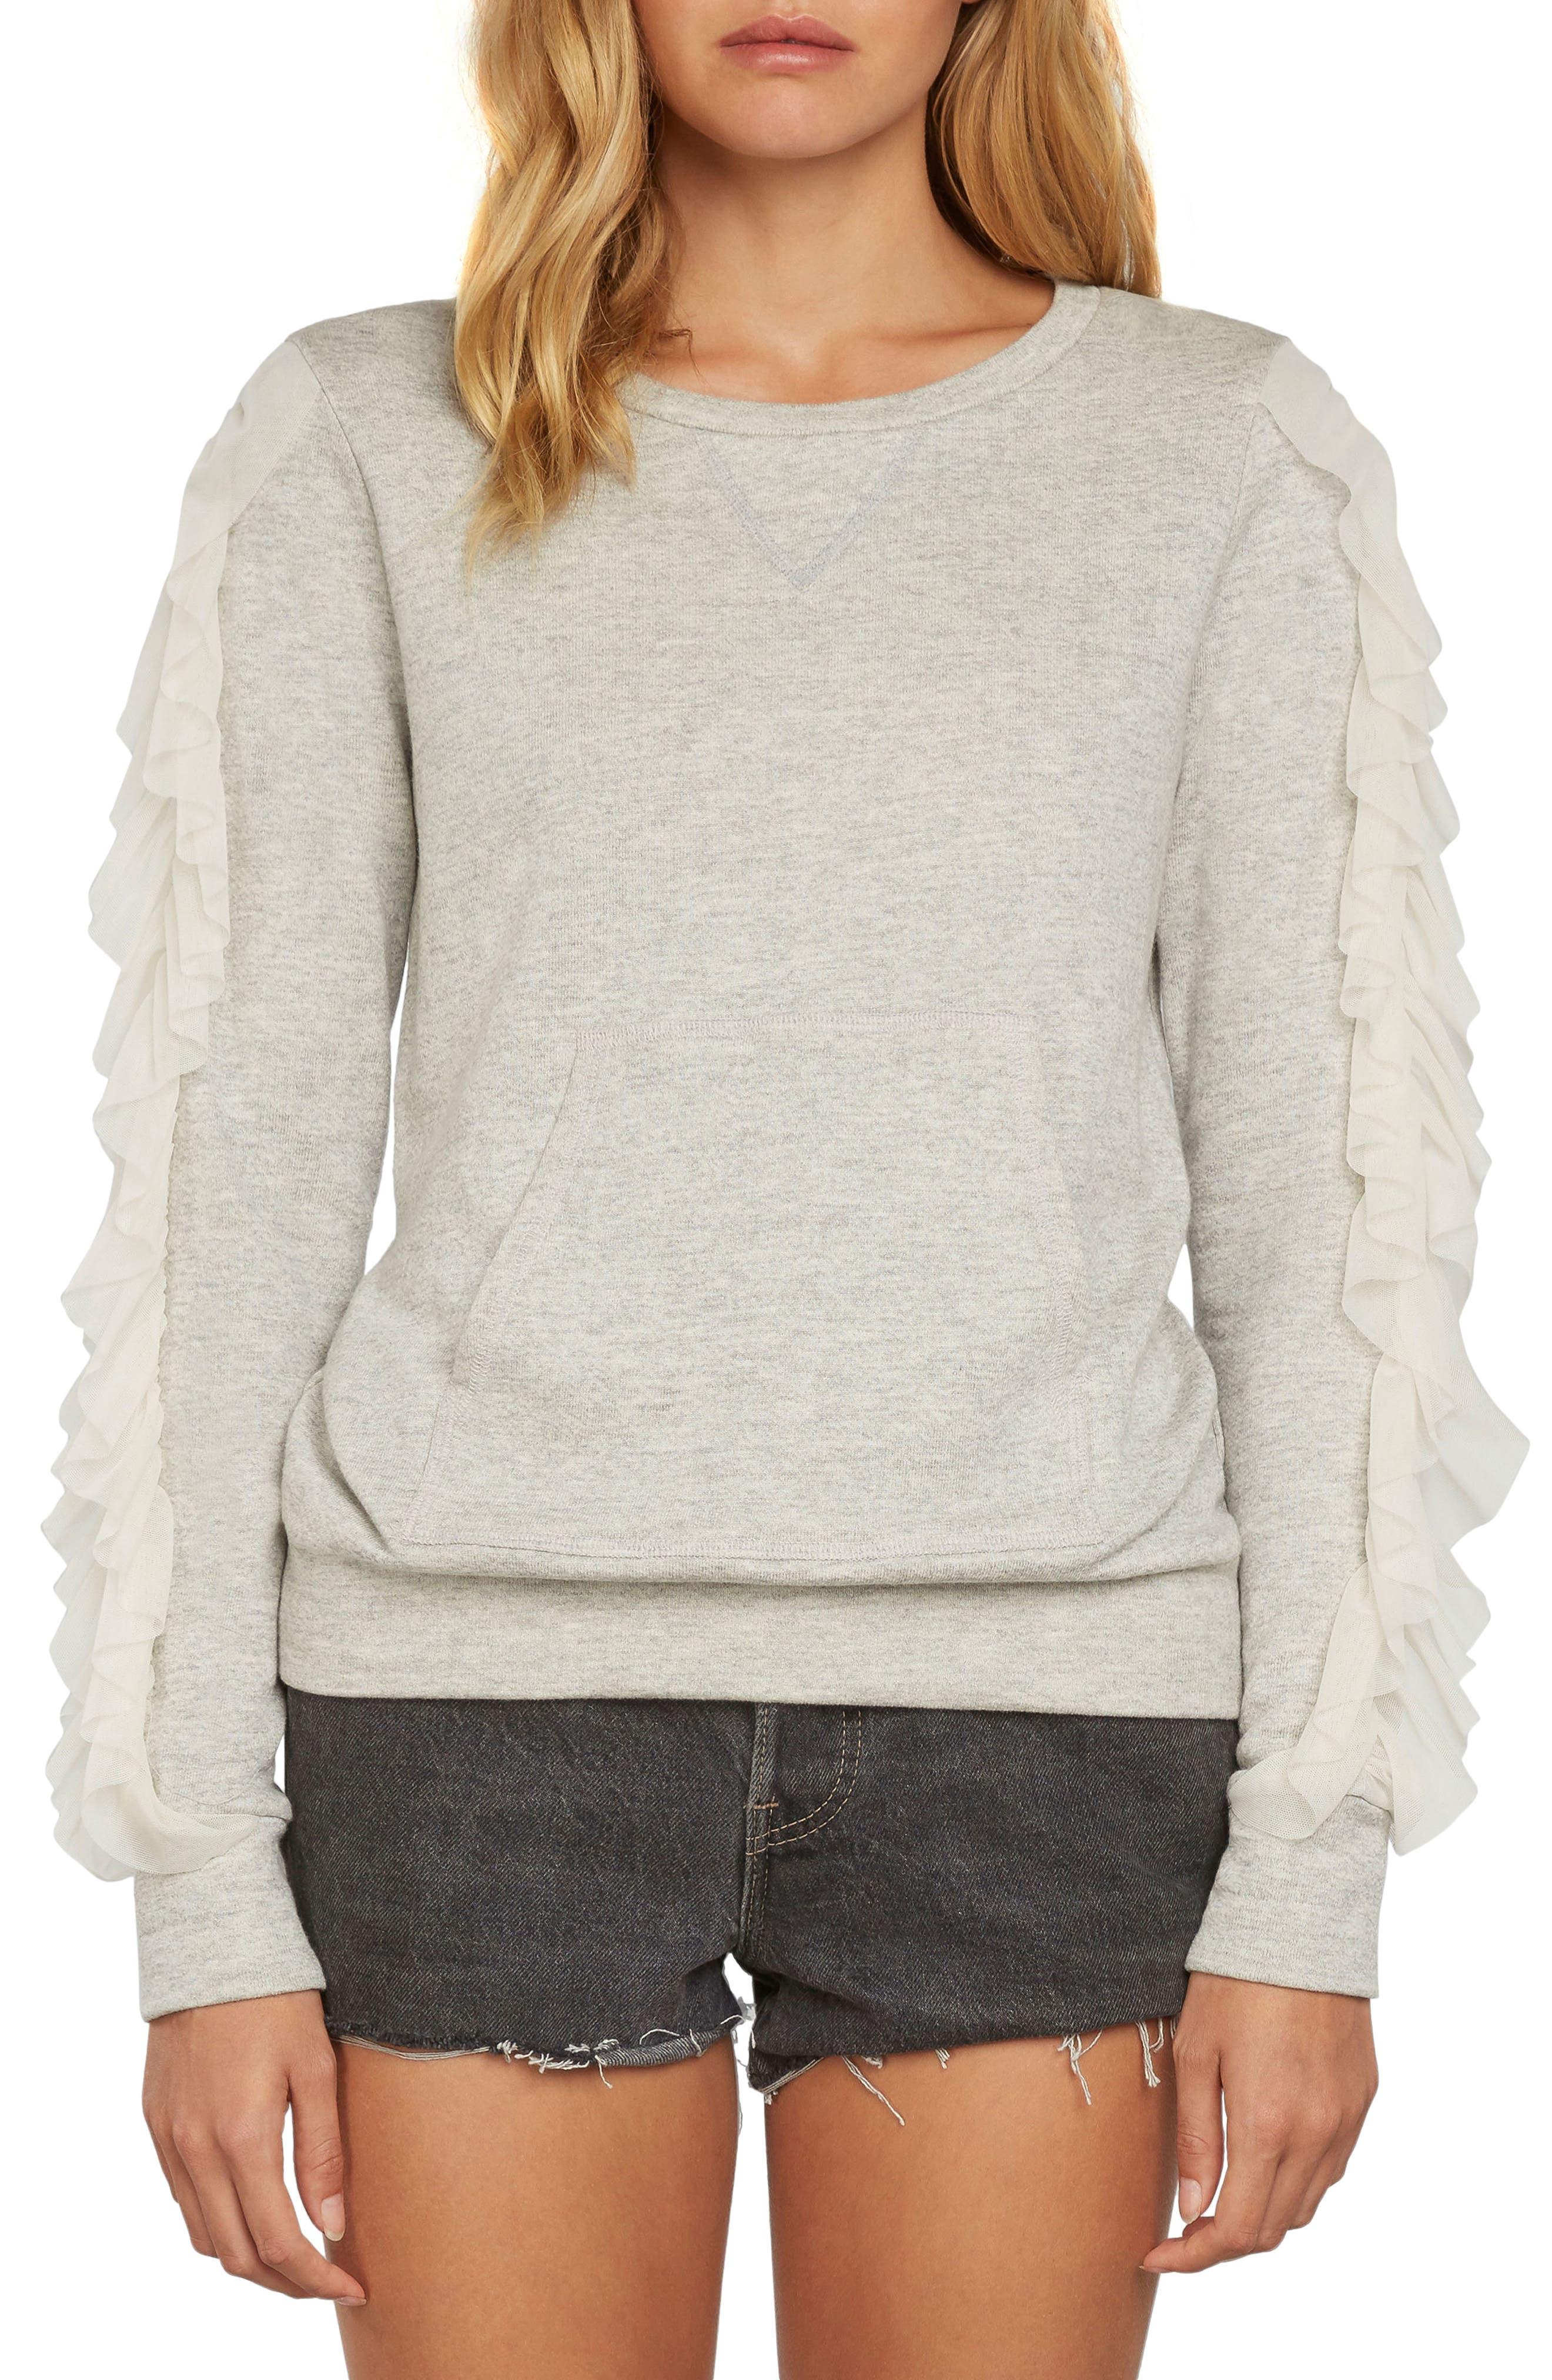 Ruffle Pullover Knit Sweatshirt,                             Main thumbnail 1, color,                             Heather Grey